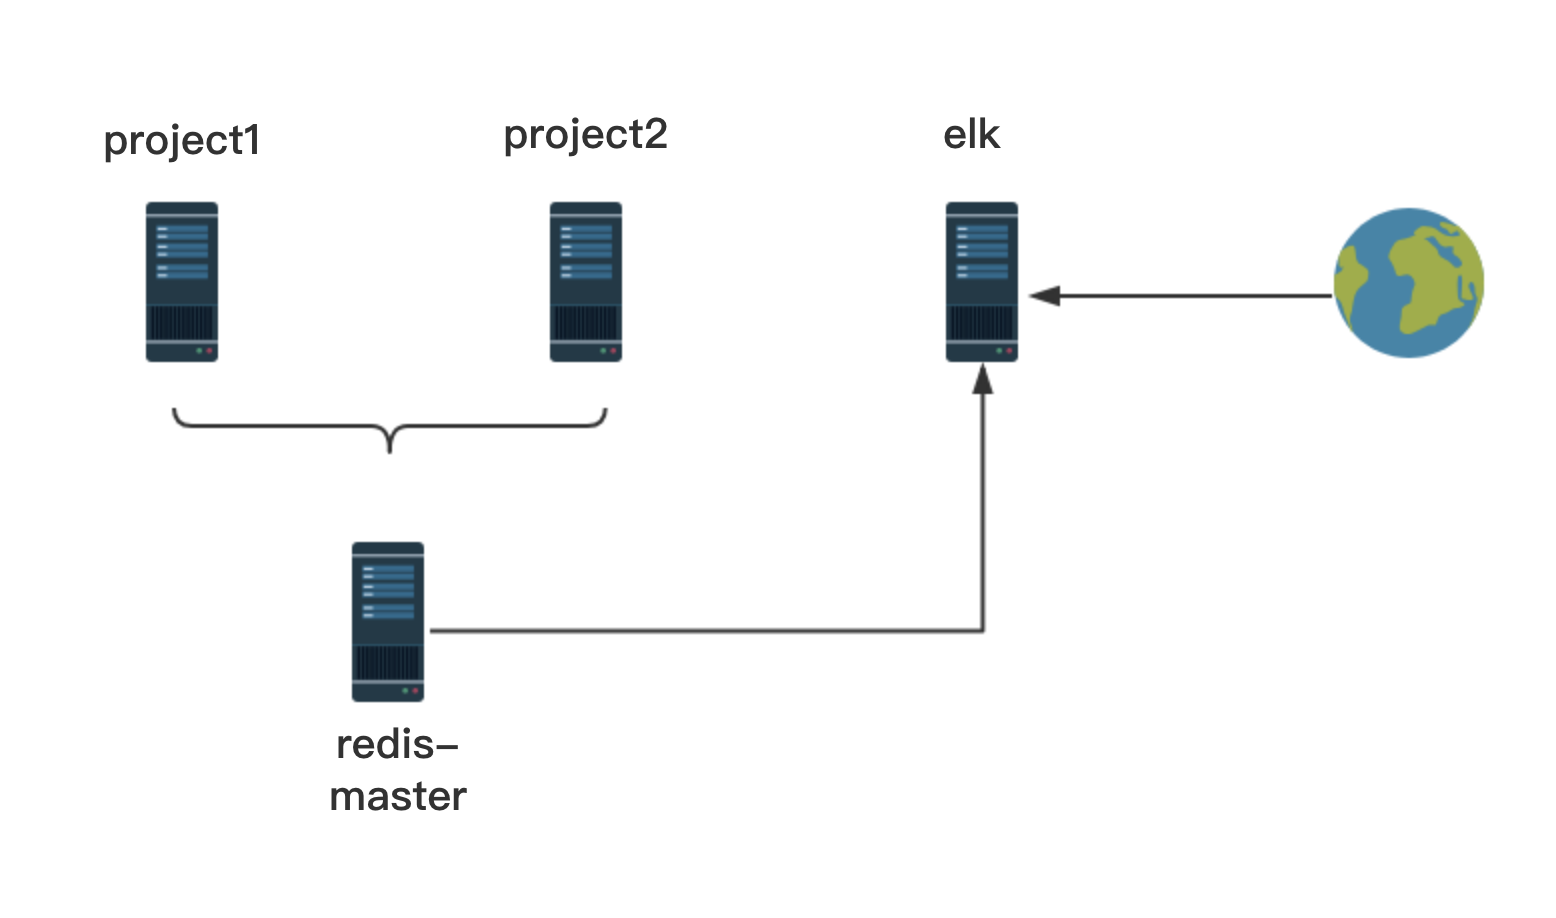 elk stack实践| zhimma's blog